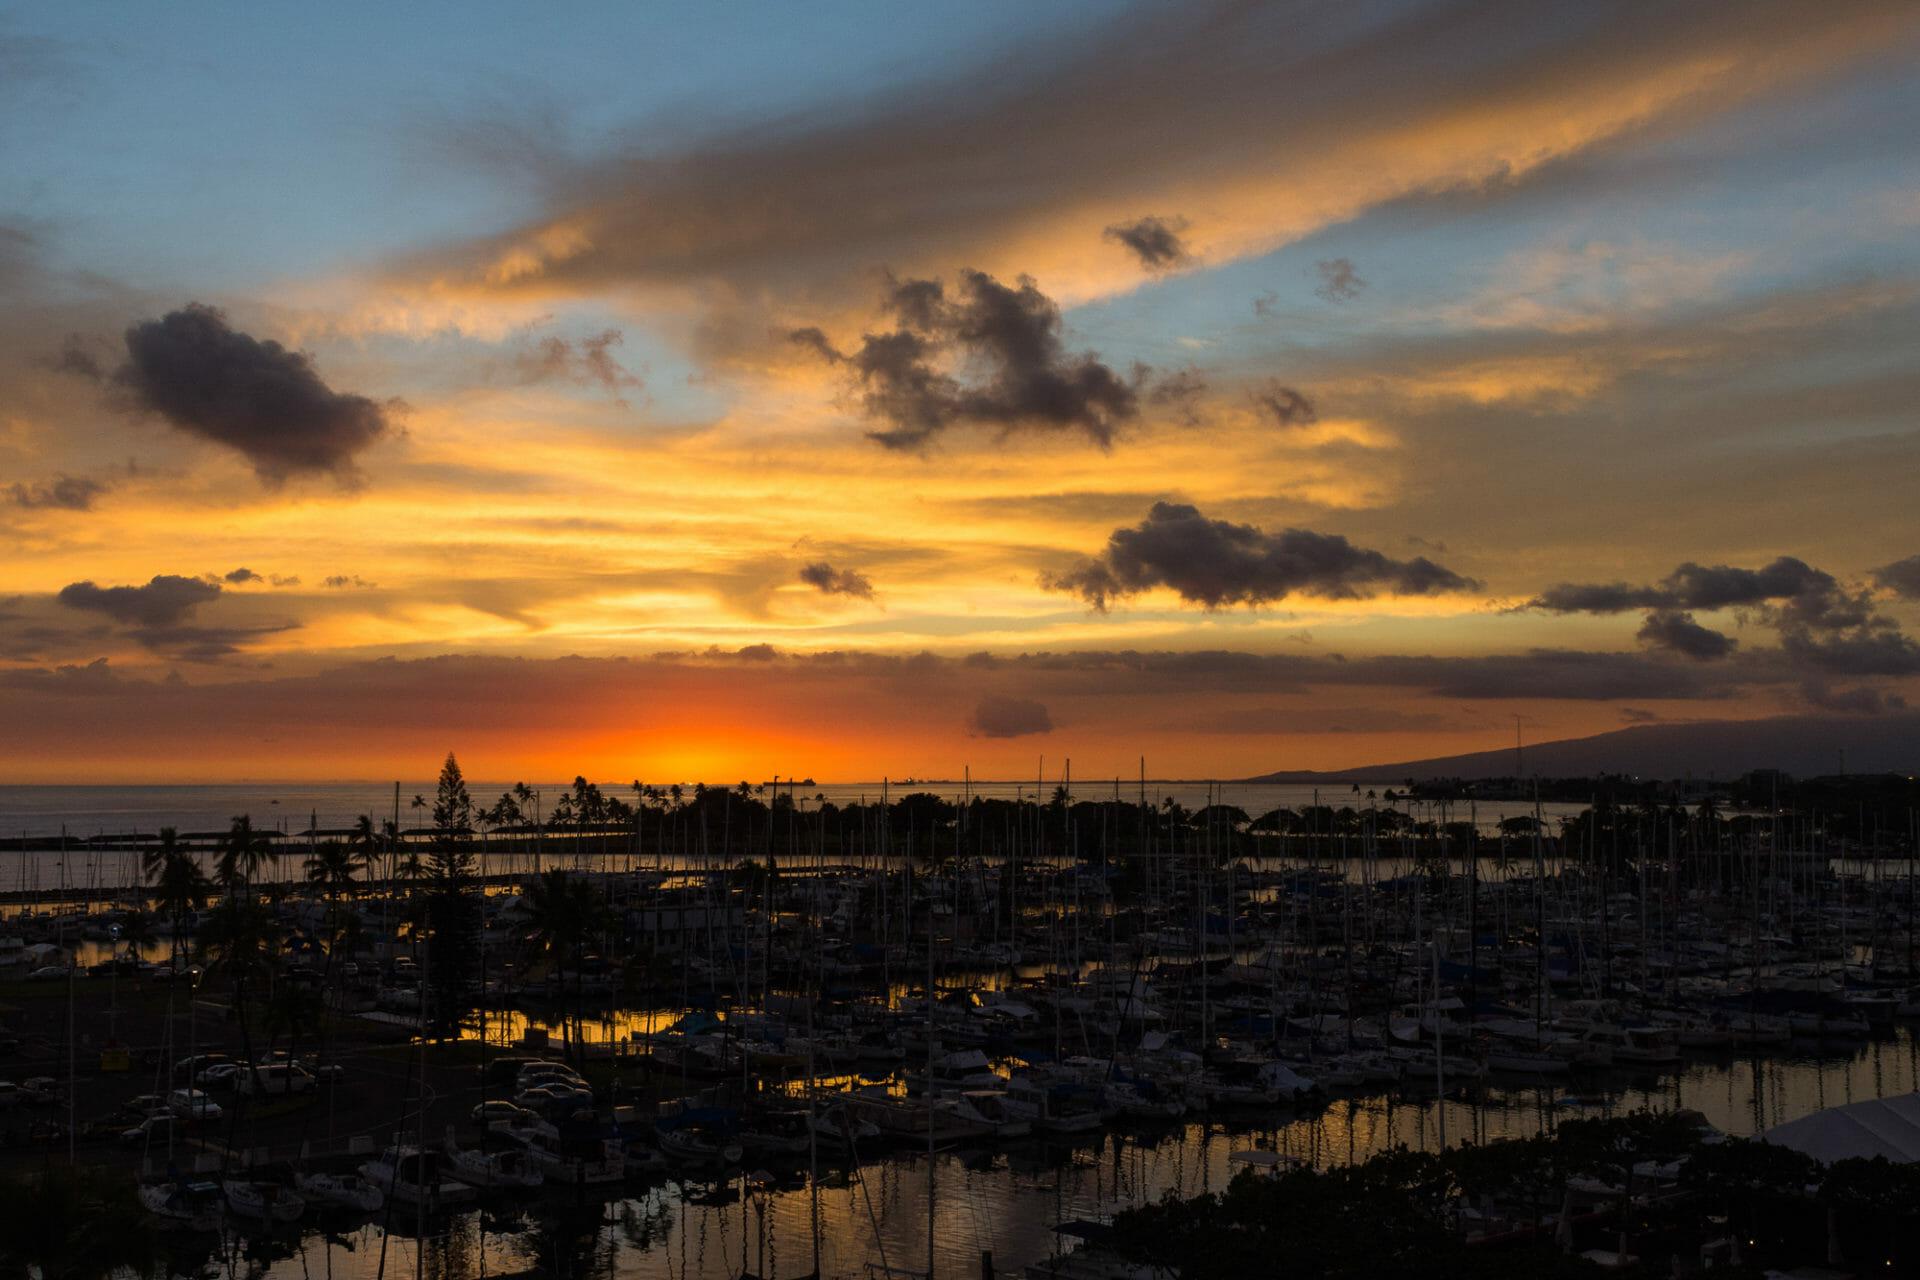 Almost last light at Ala Wai Harbor